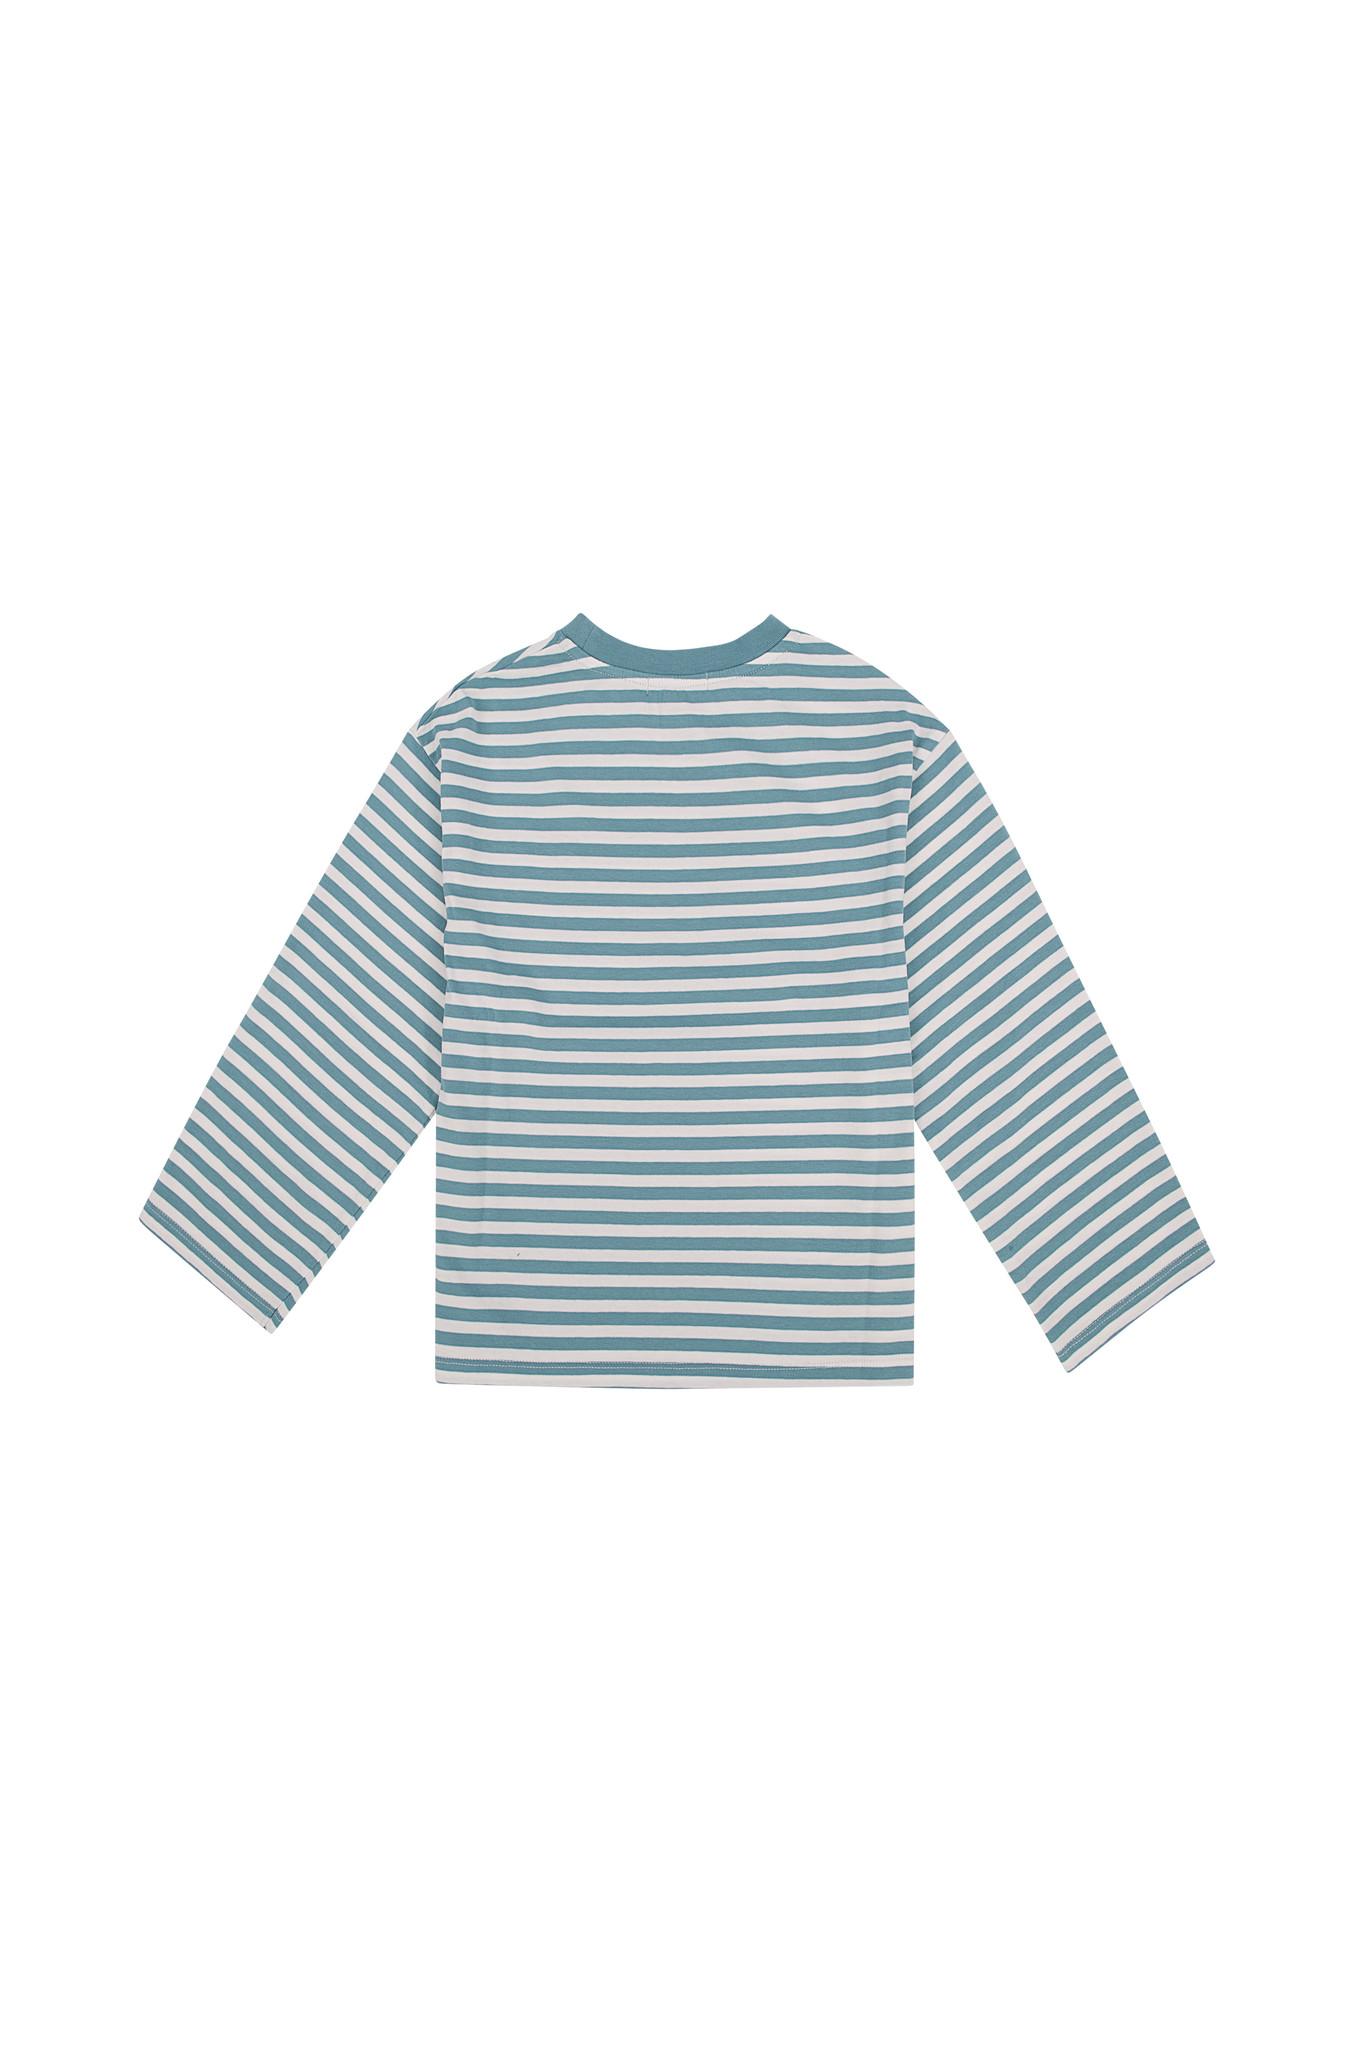 Sailor tee - Deep Blue-3